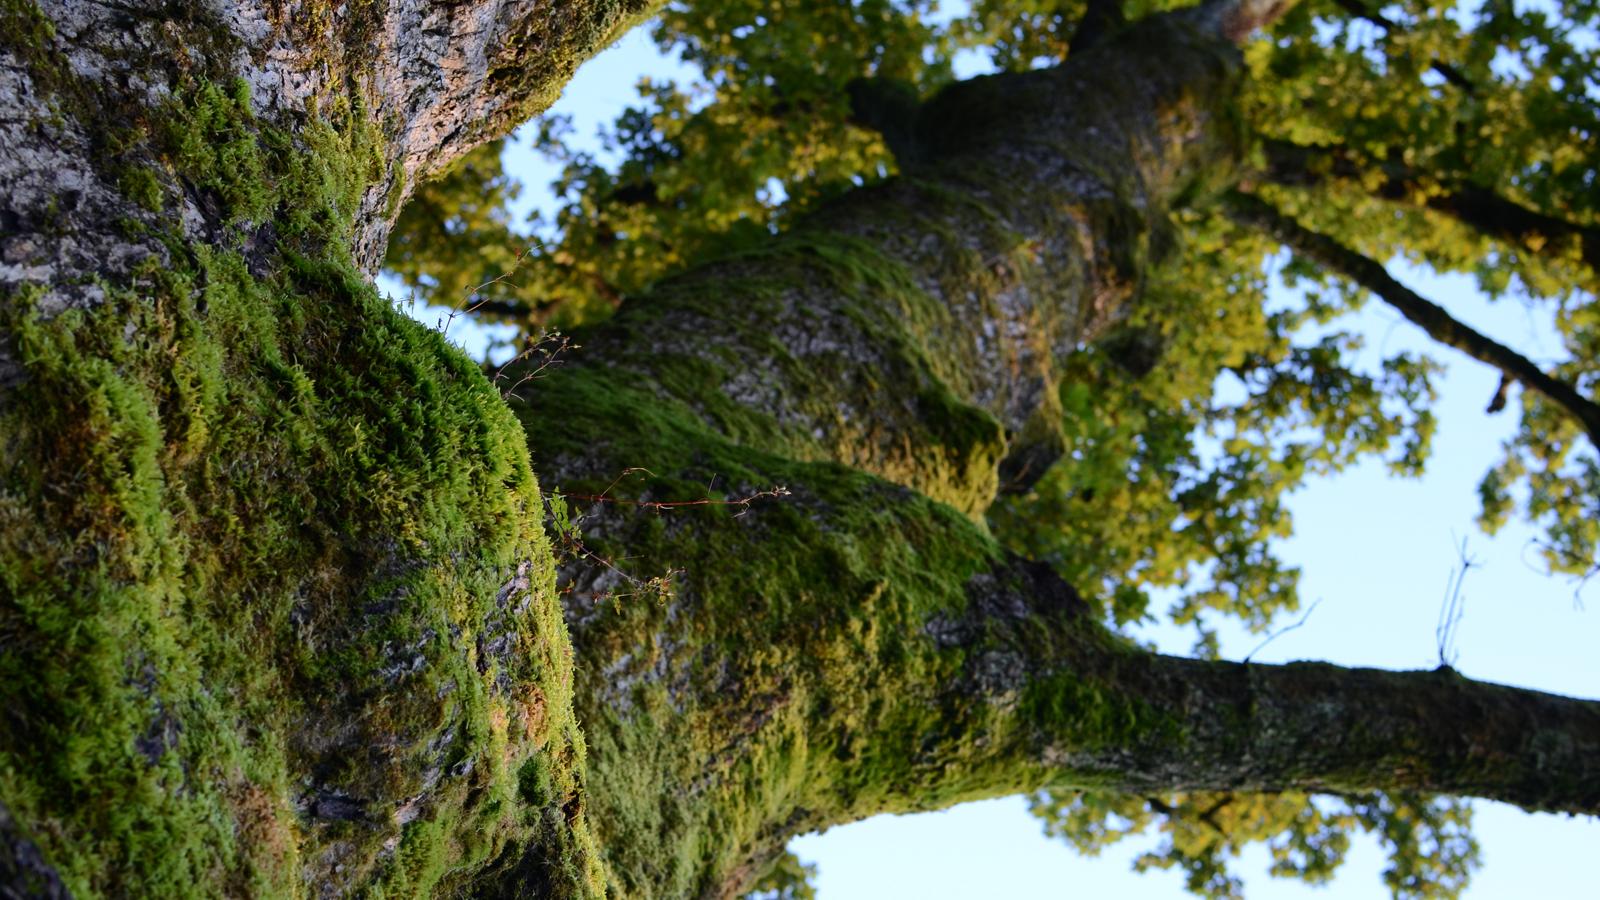 alcarol-undergrowth-collection-2